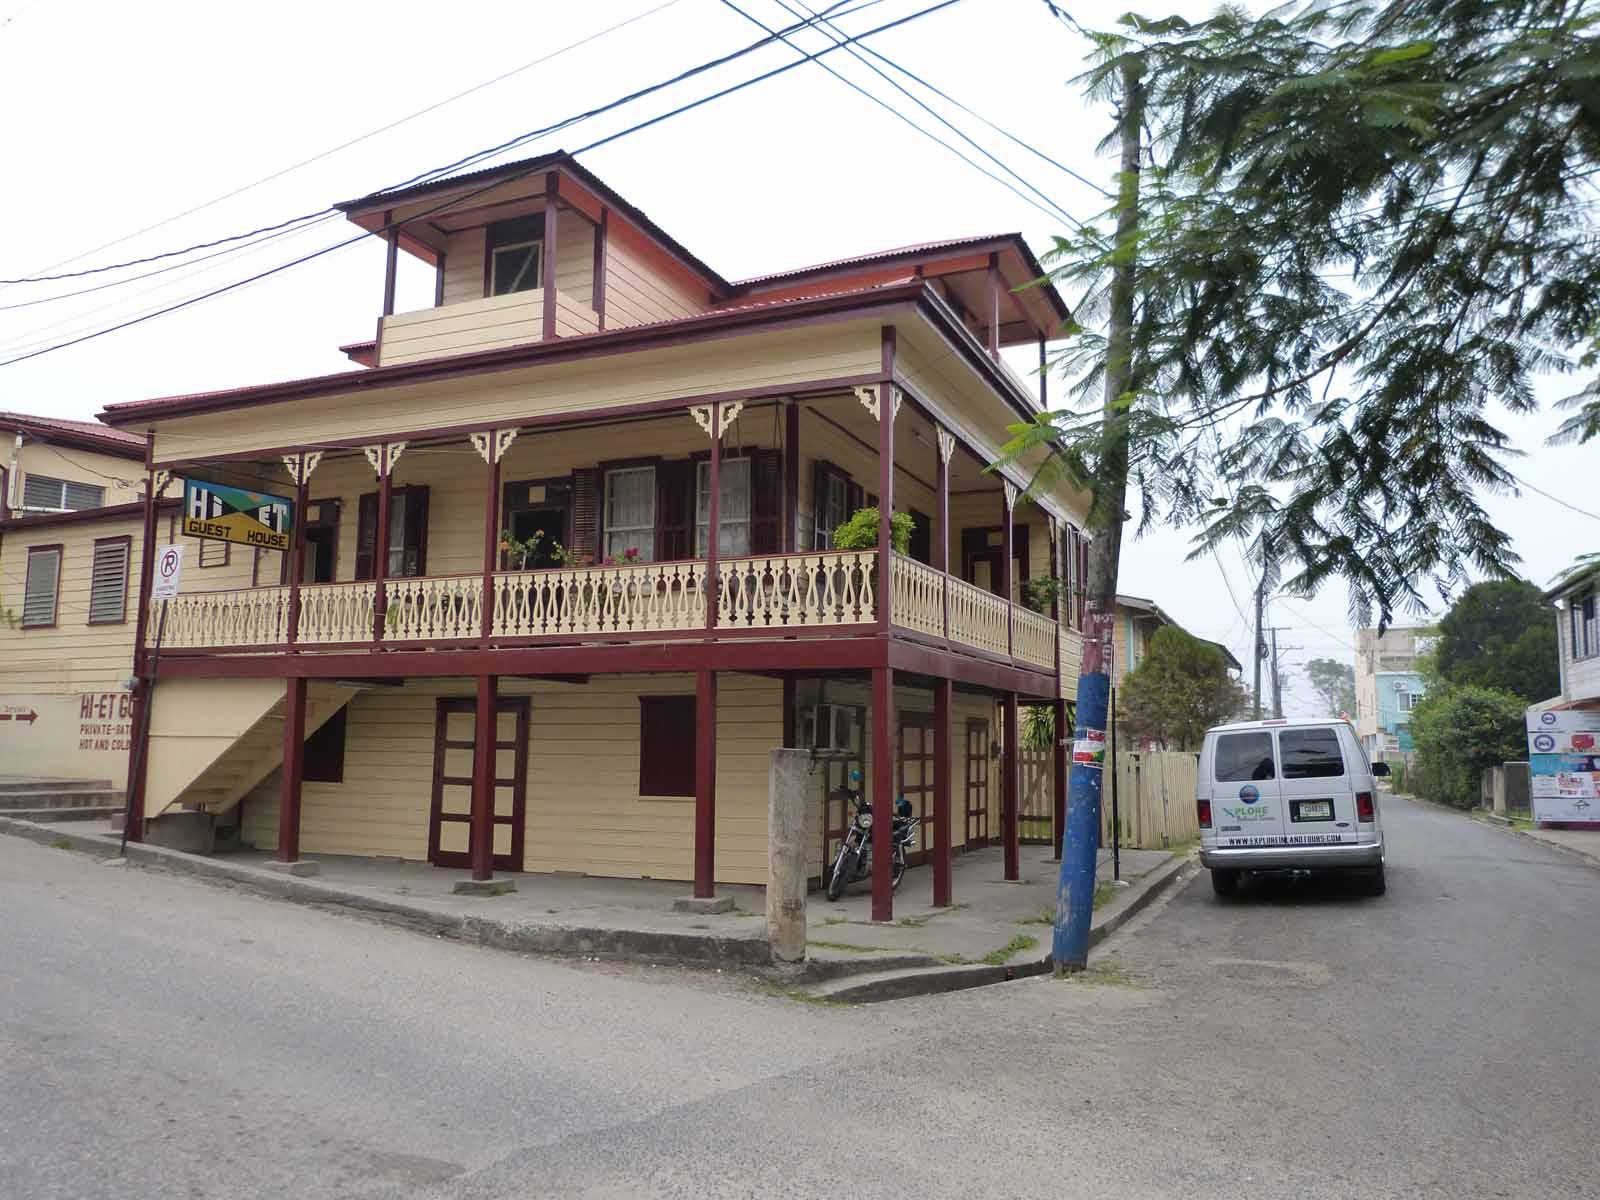 Belize, San Ignacio